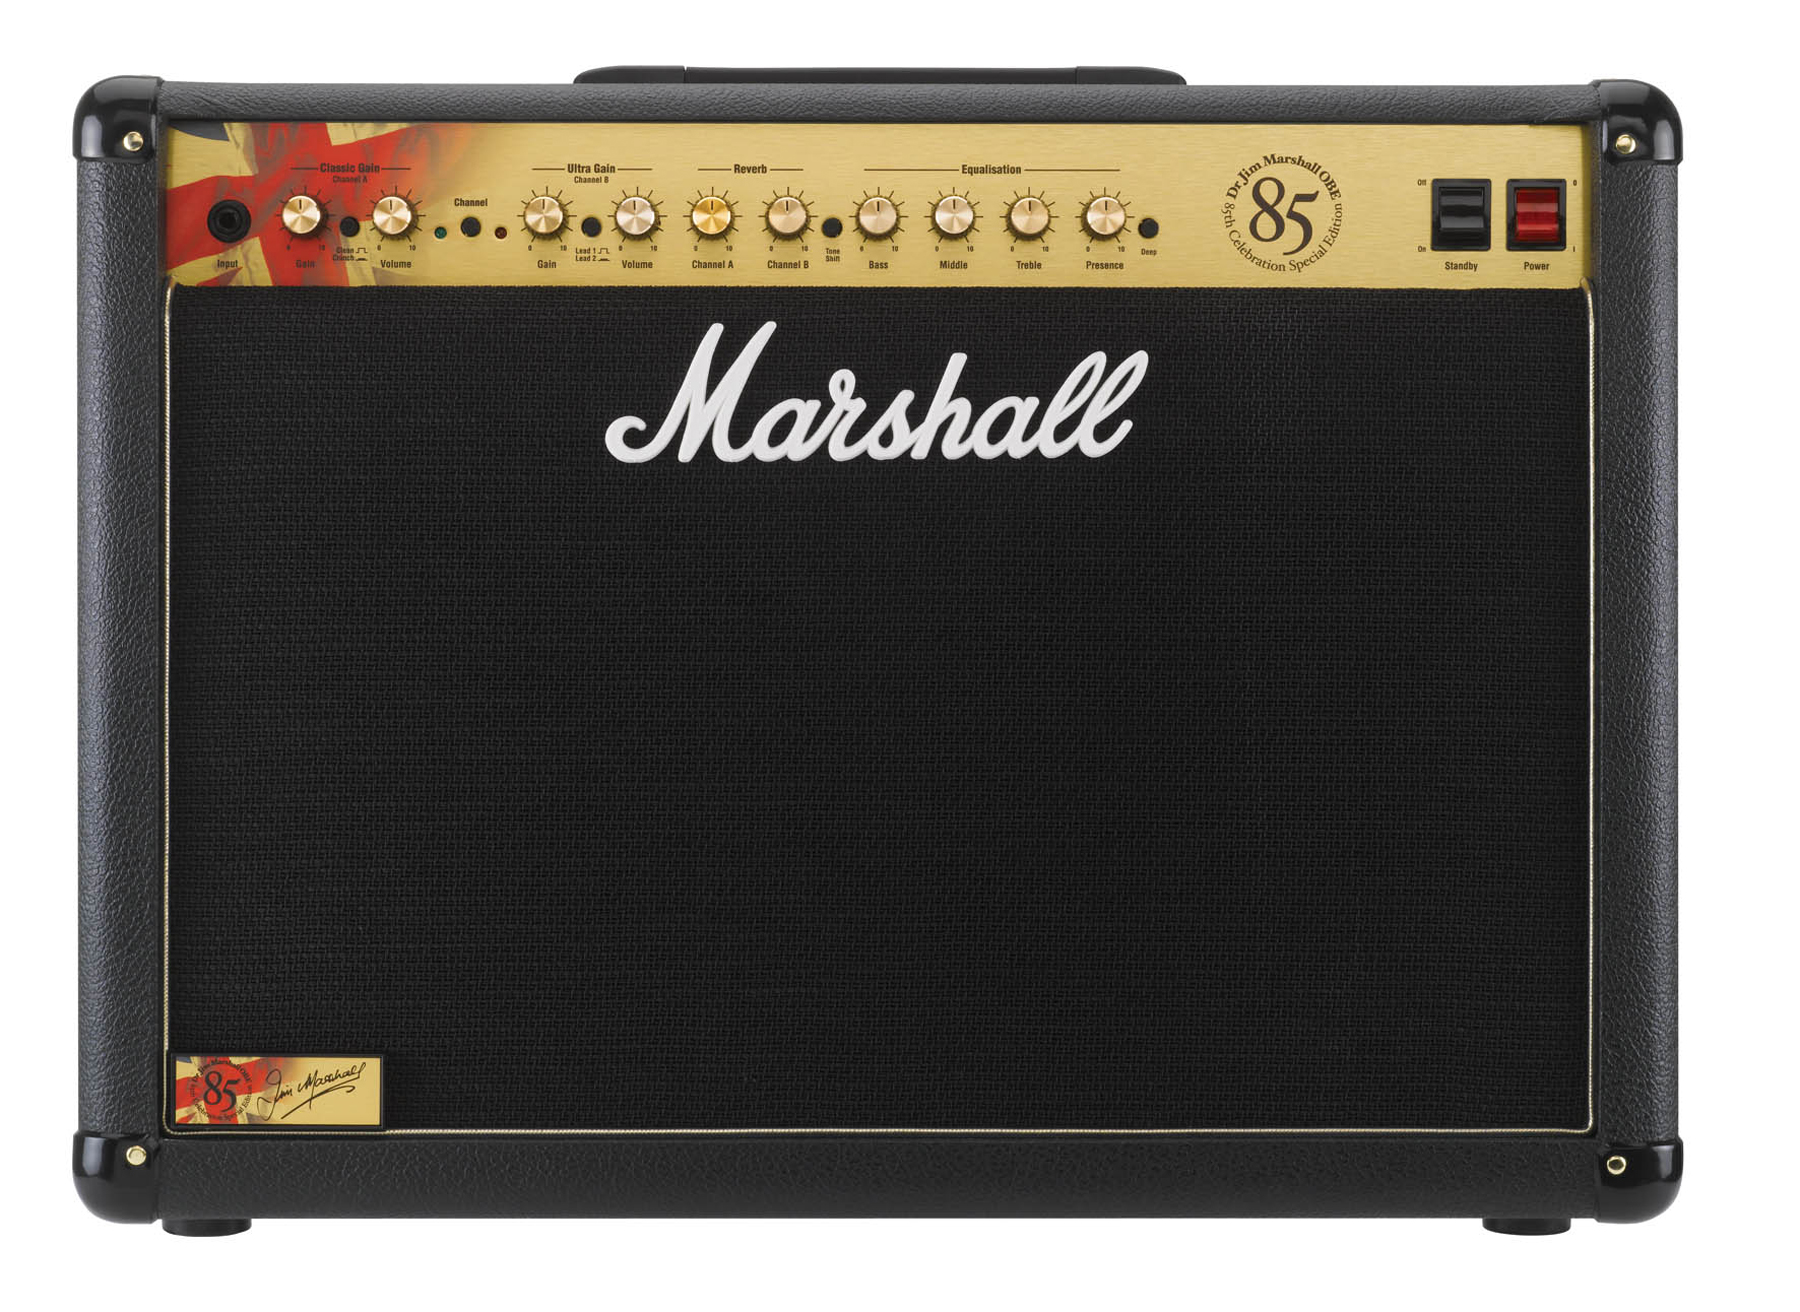 Best valves for Marshall 1923 85th Anniversary amplifier